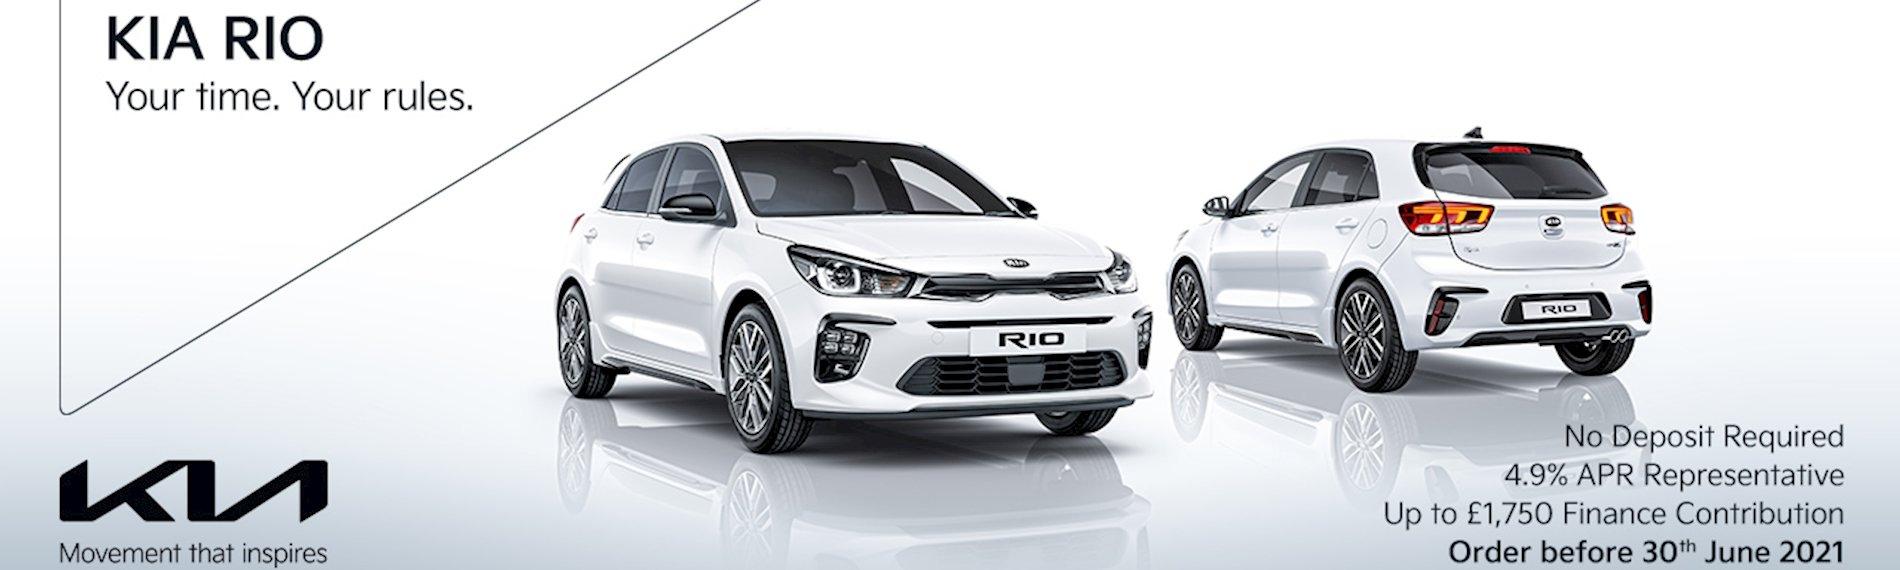 The Kia Rio